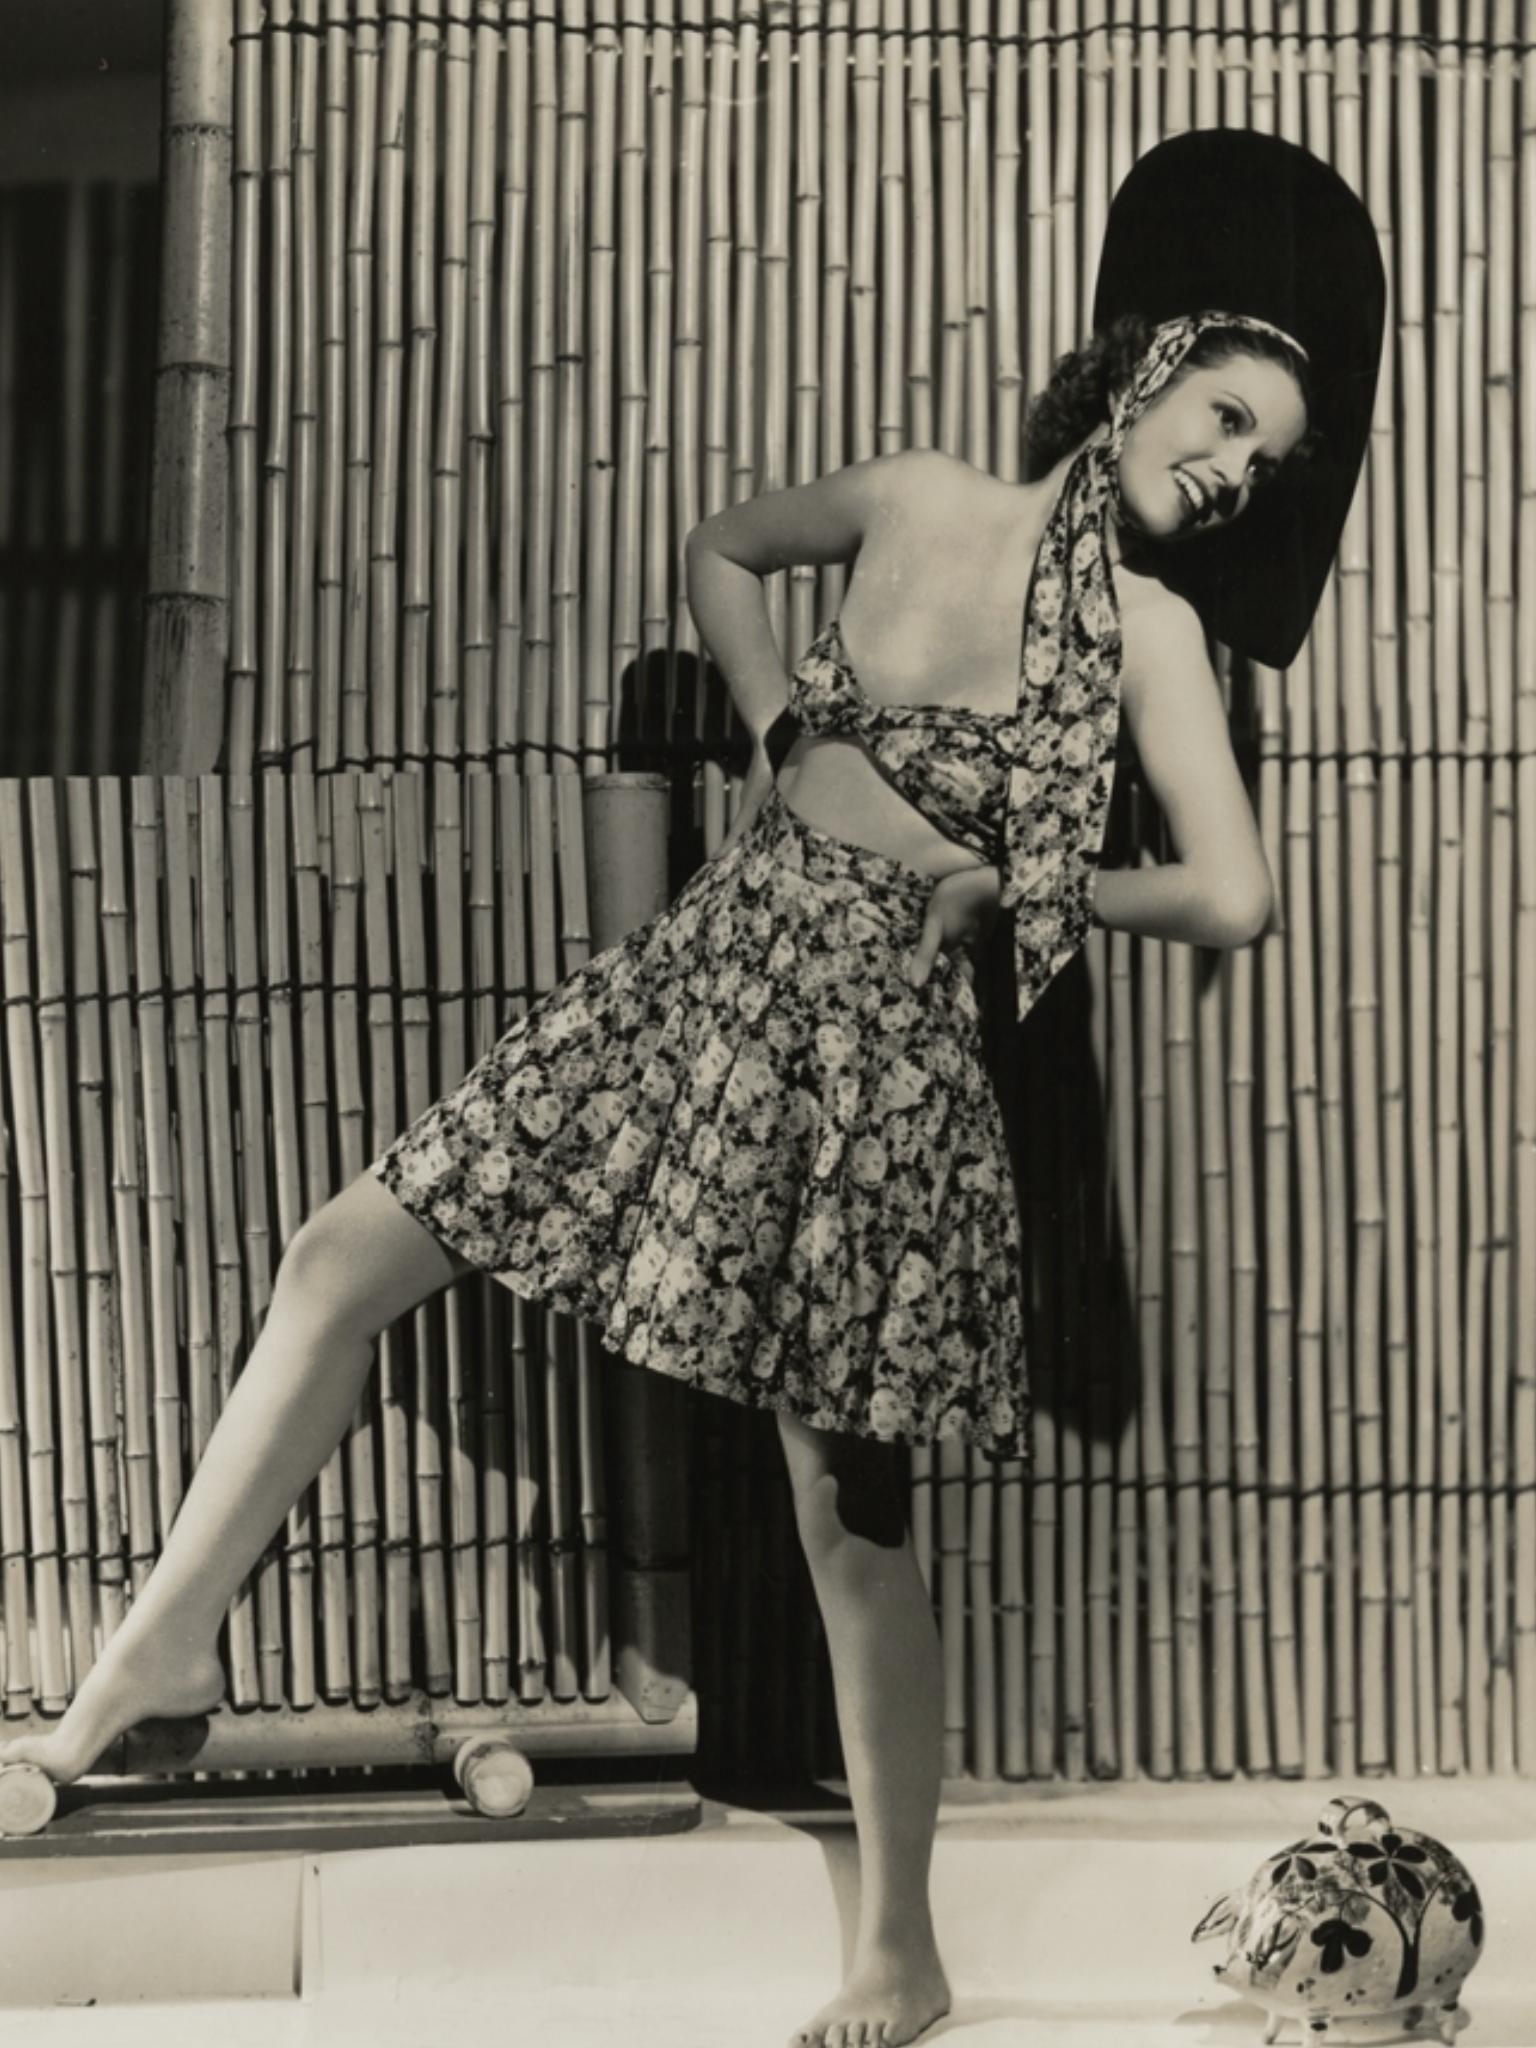 Marguerite Churchill marguerite chapman